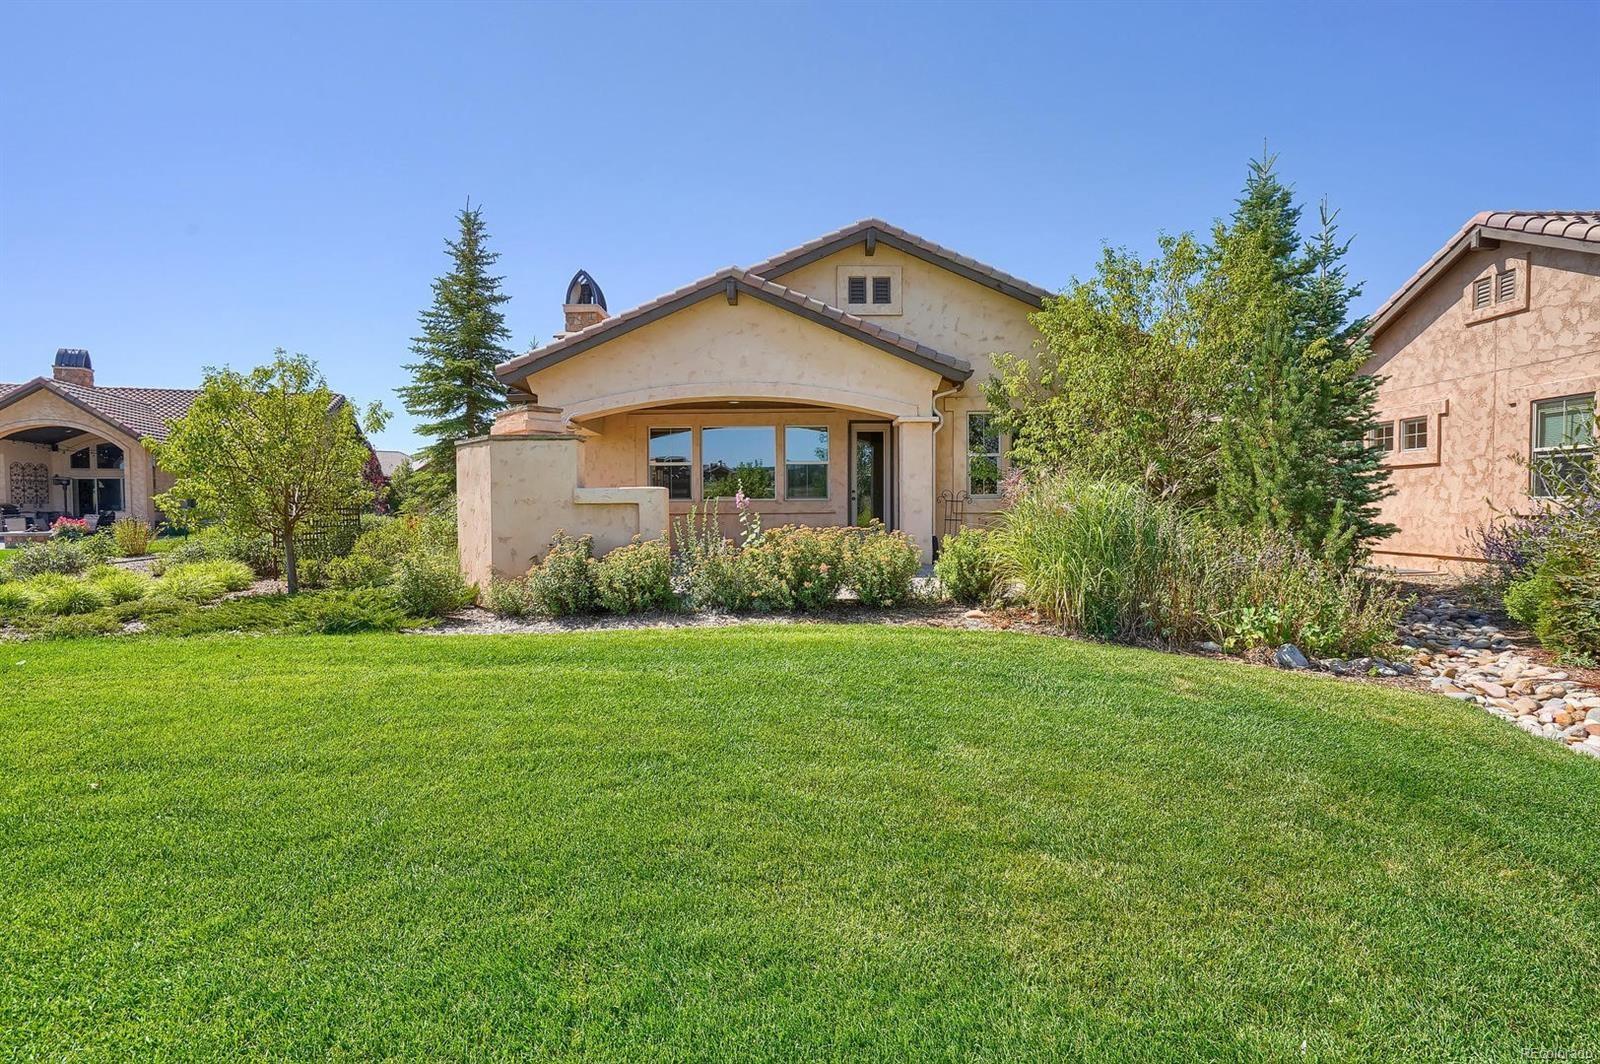 MLS# 7383029 - 40 - 2276 Rocking Horse Court, Colorado Springs, CO 80921